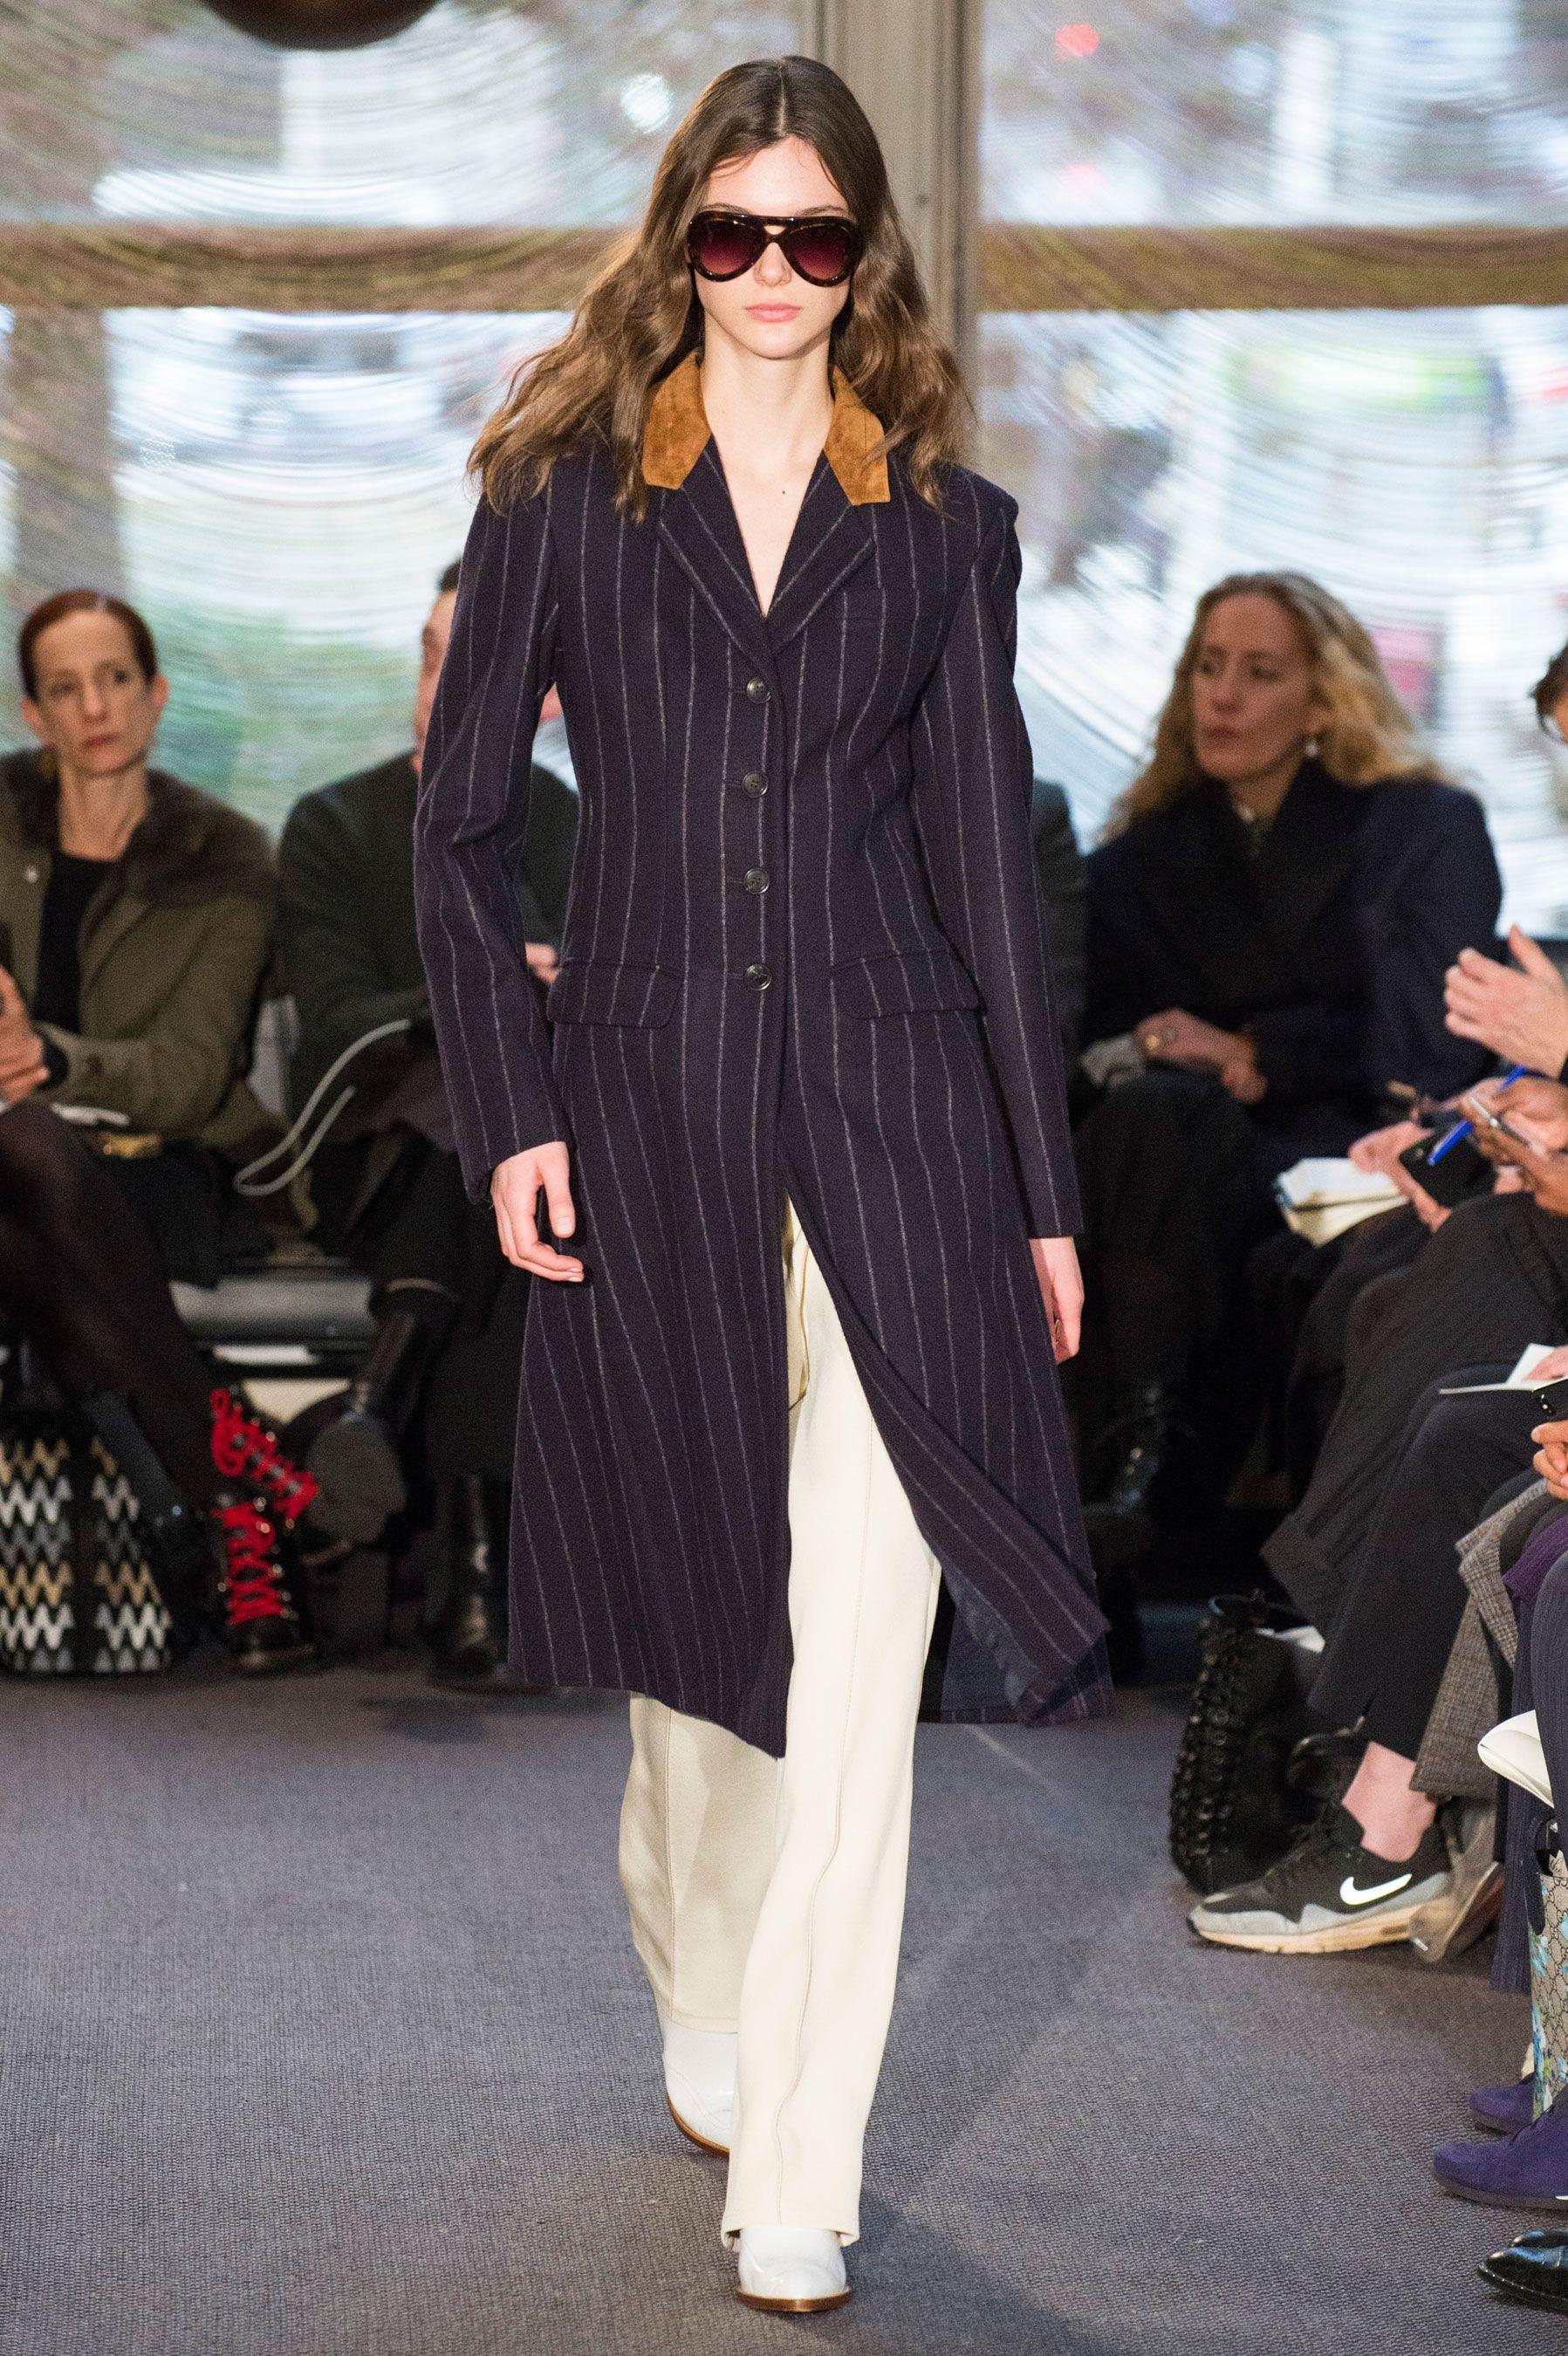 882cb9aa9aa 34 Looks From Derek Lam Fall 2018 NYFW Show – Derek Lam Runway at New York  Fashion Week